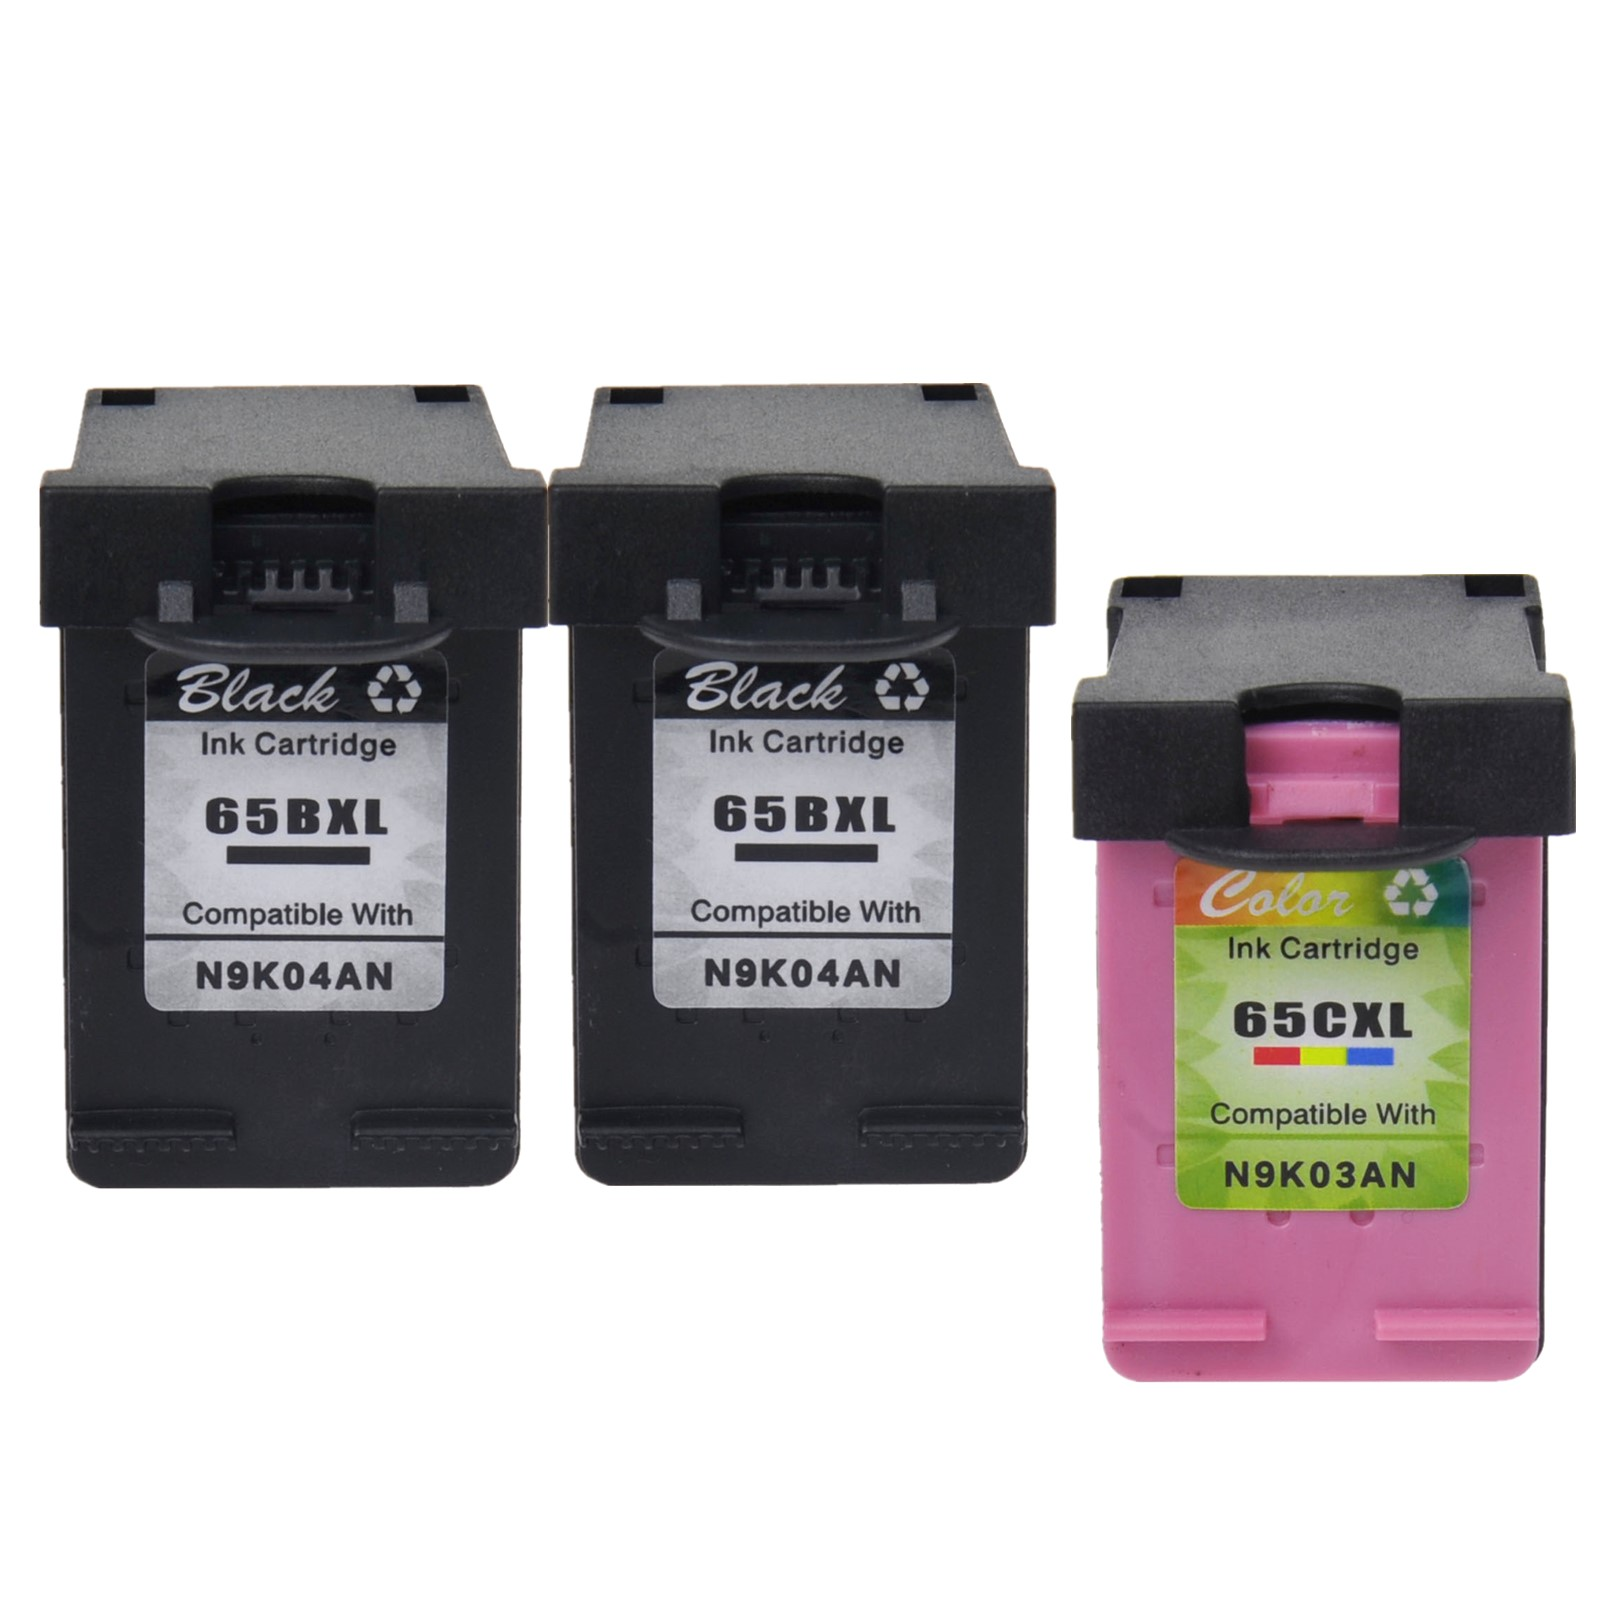 1PK Color 2PK Black Compatible with HP 65XL Ink N9K03AN N9K04AN for Deskjet 2655